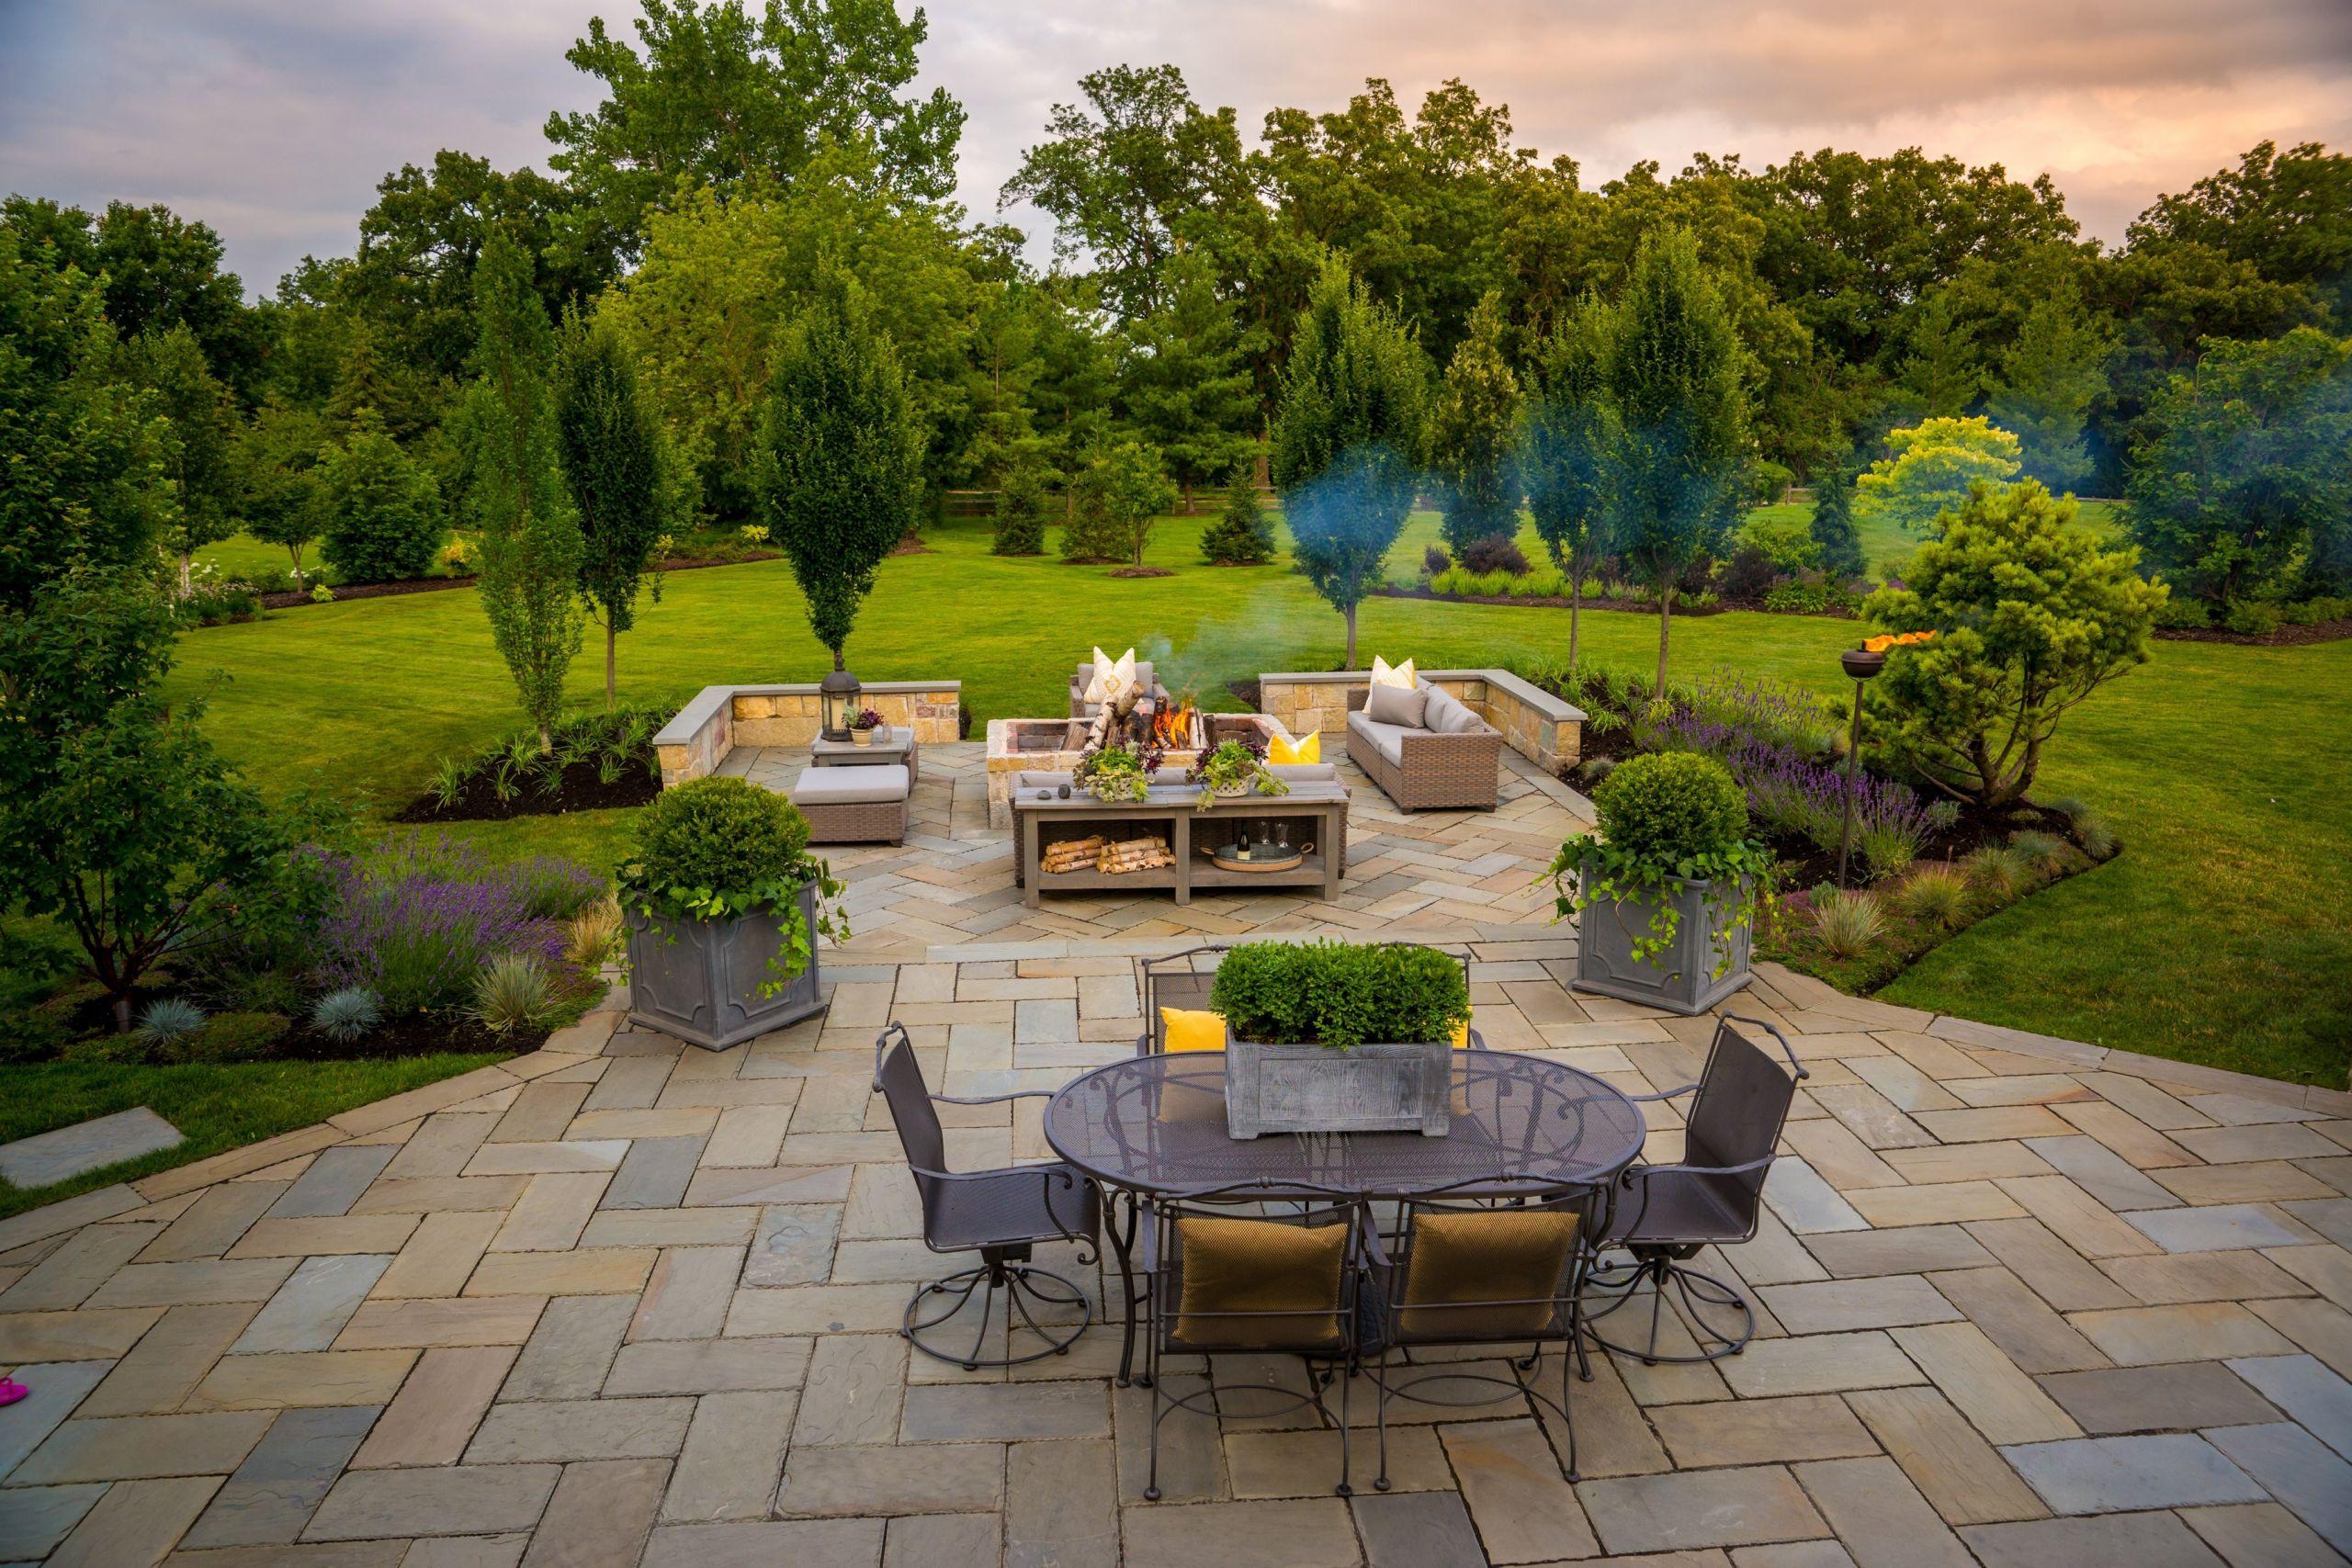 Outdoor Landscape Decor  A Backyard Landscape Design for Outdoor Entertaining